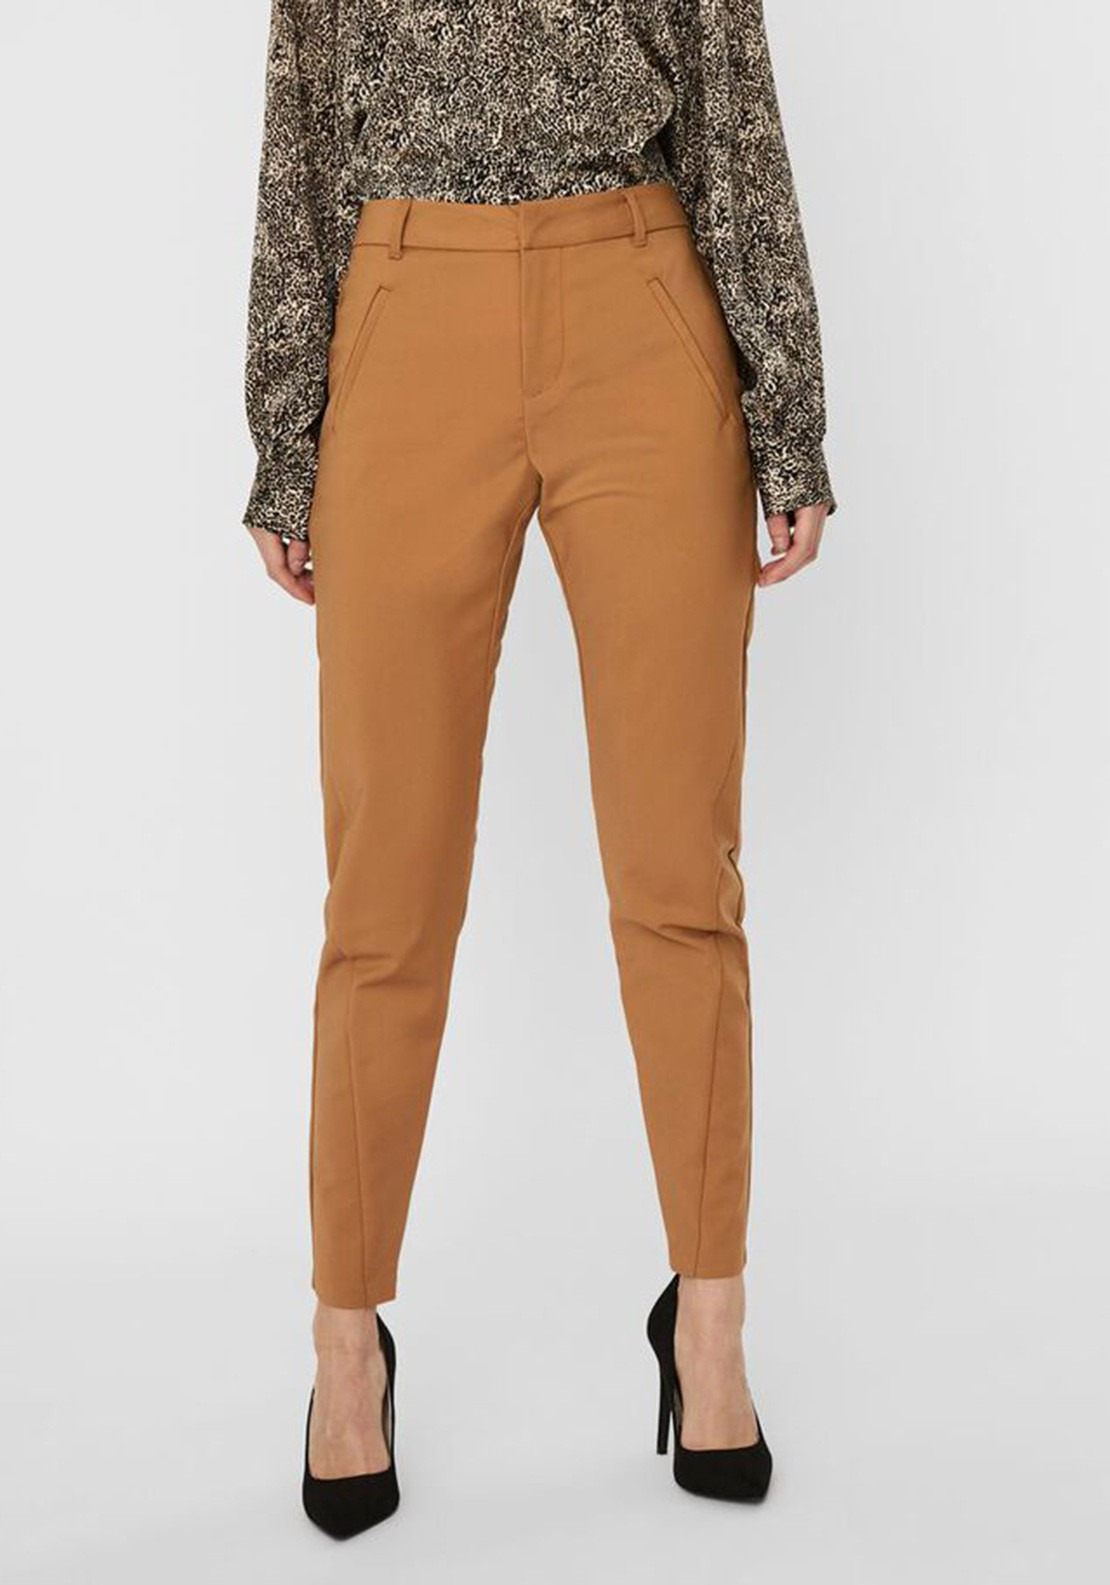 Pantaloni Vero Moda Casual (4587) photo